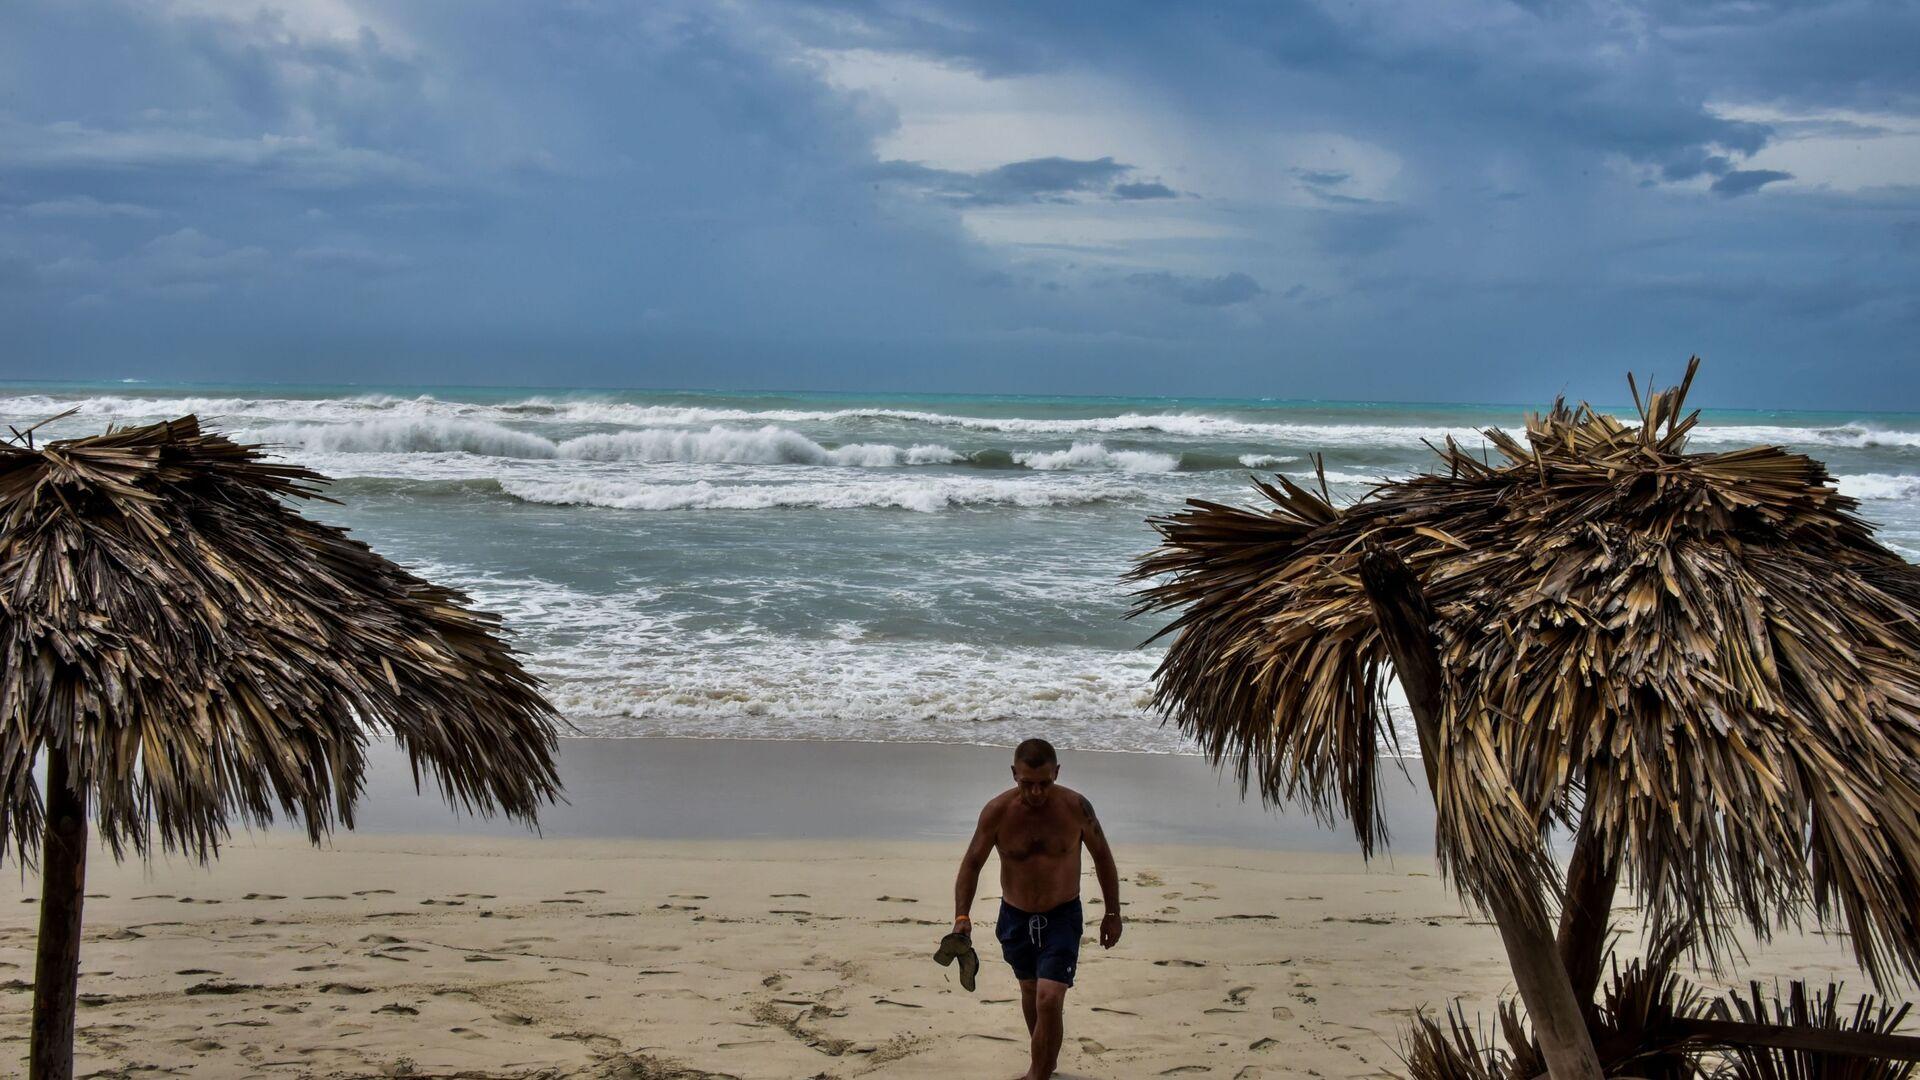 Пляж Варадеро, Куба - РИА Новости, 1920, 06.07.2021